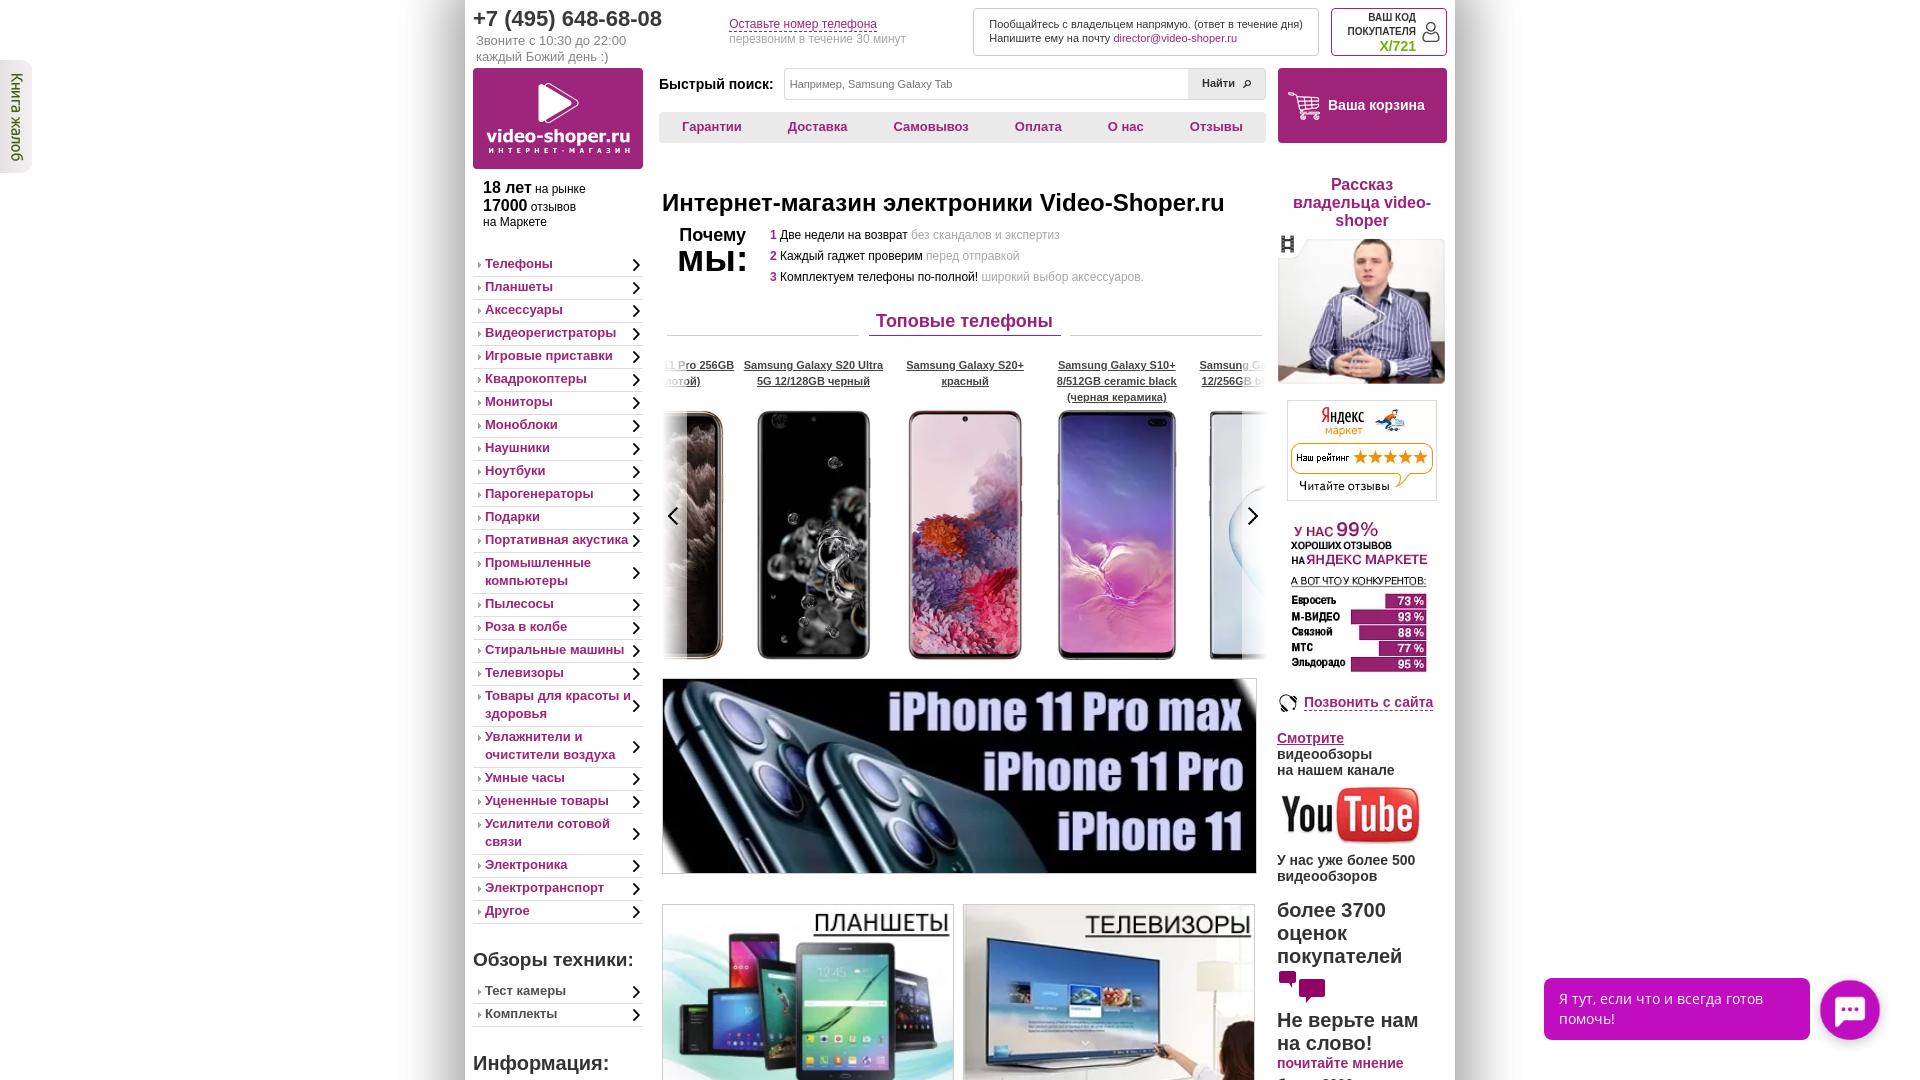 Video-shoper website